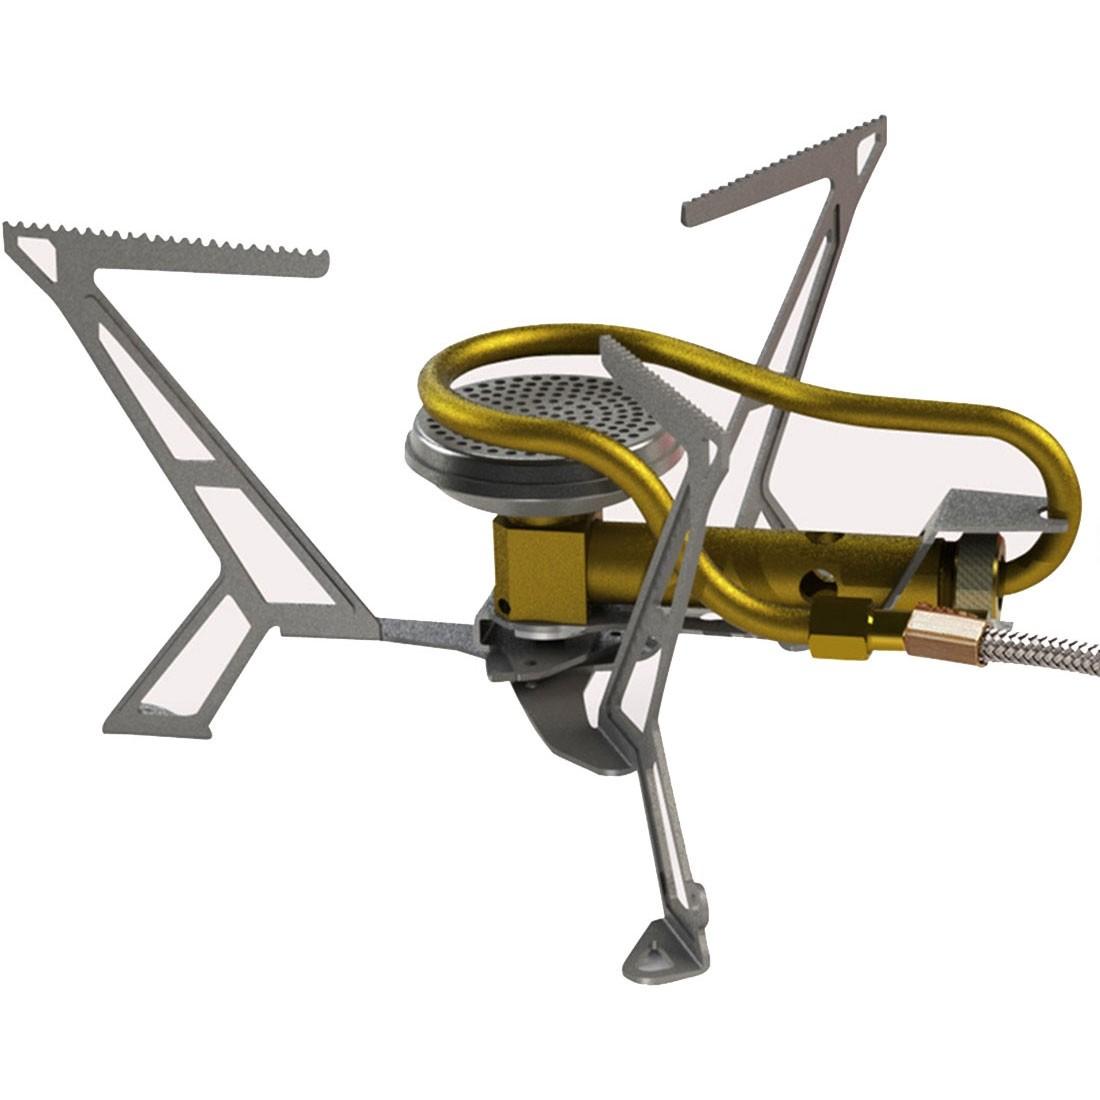 Primus Express Spider II Gas Stove